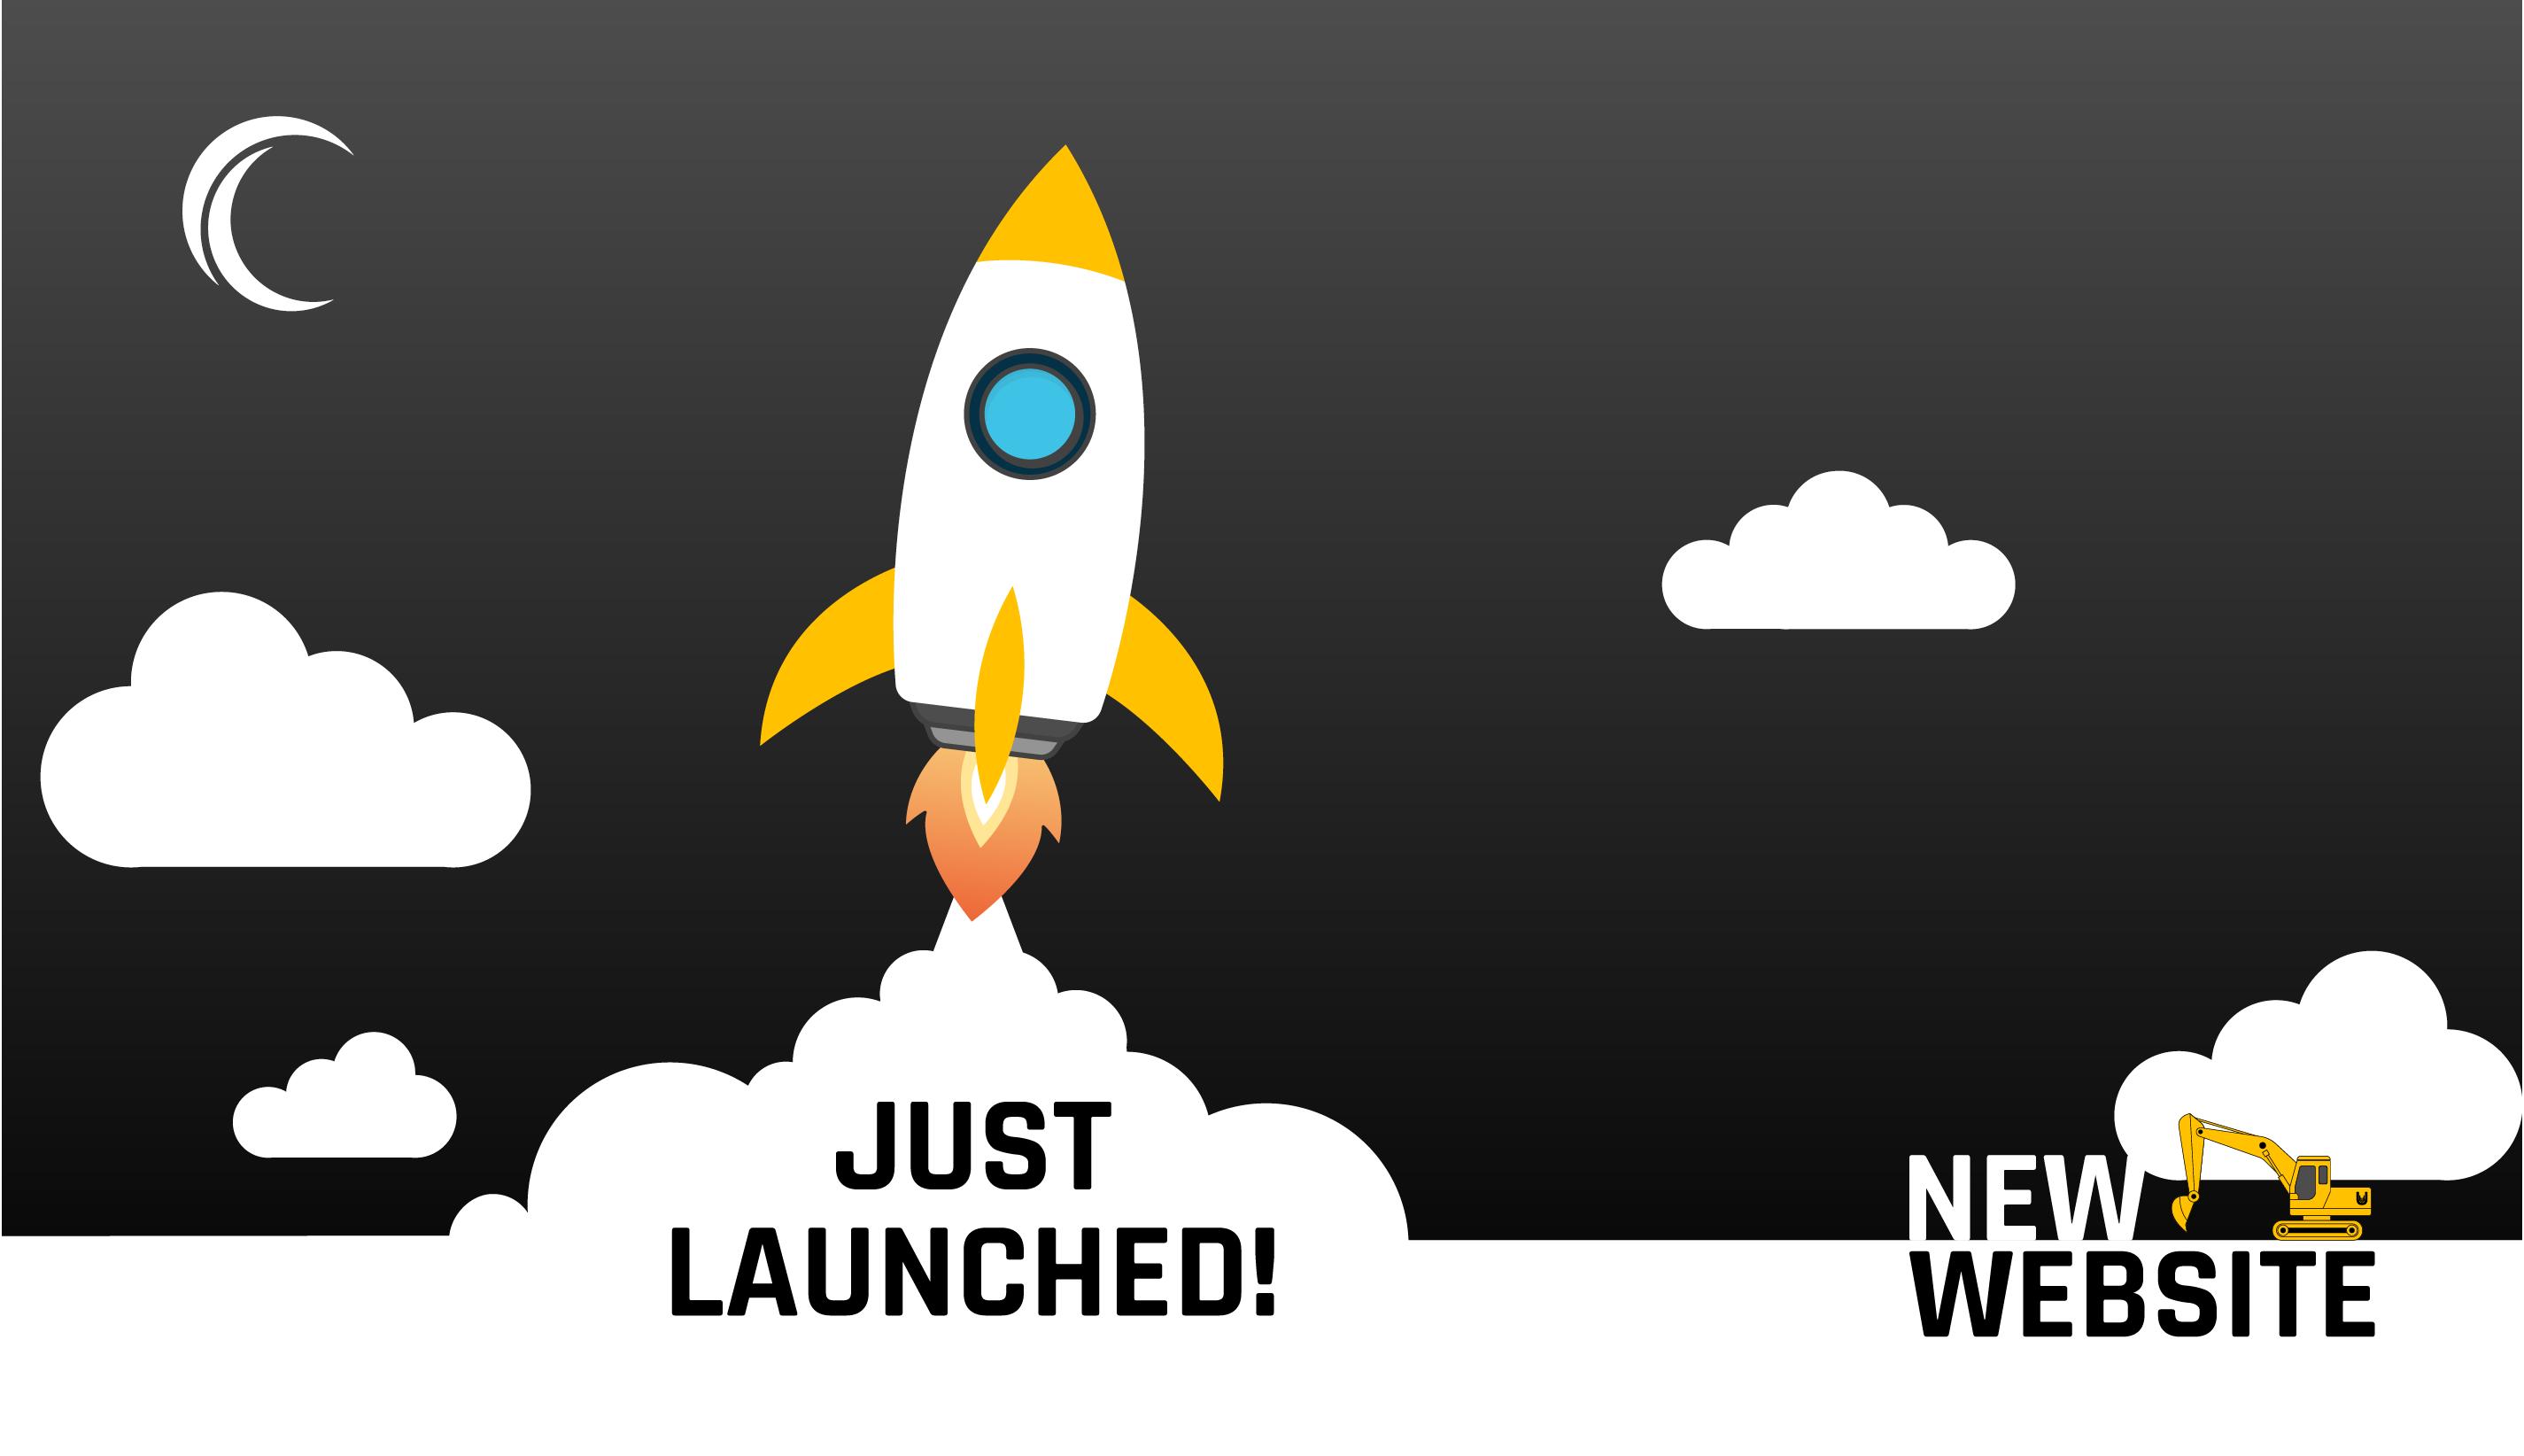 new uexcavate website